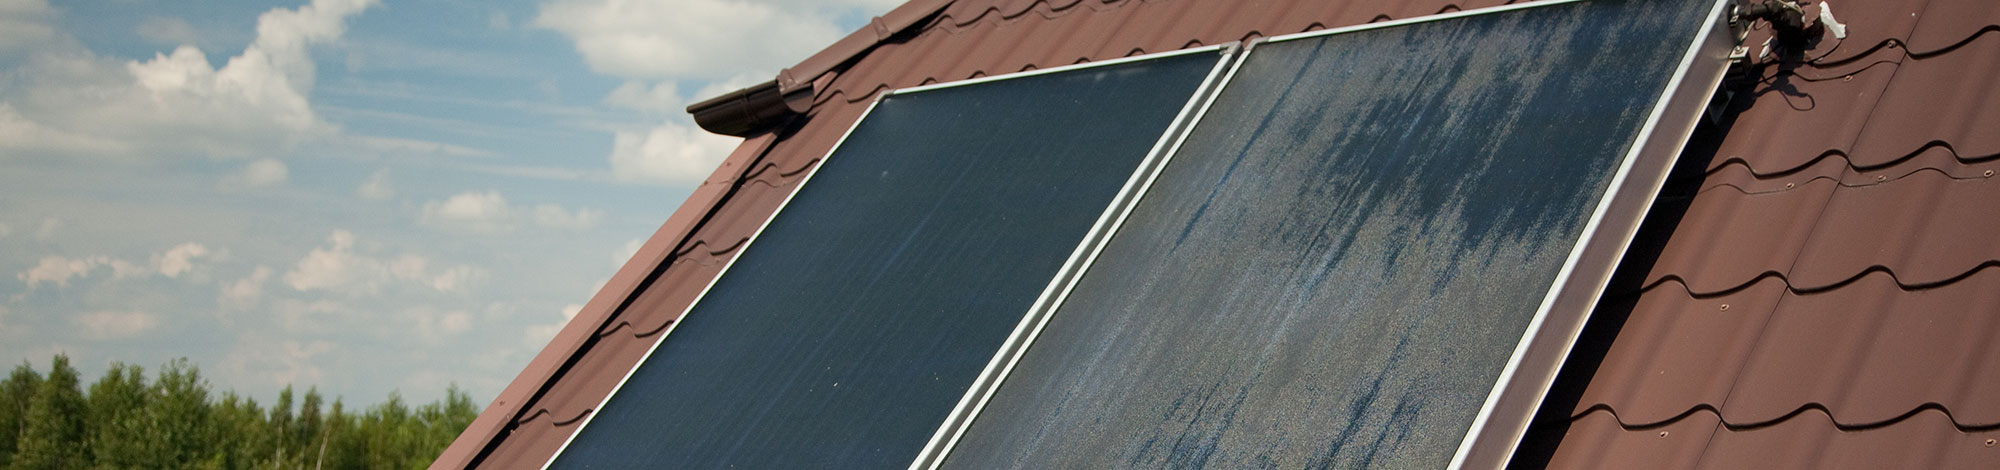 sanmont sanitär solar shop online